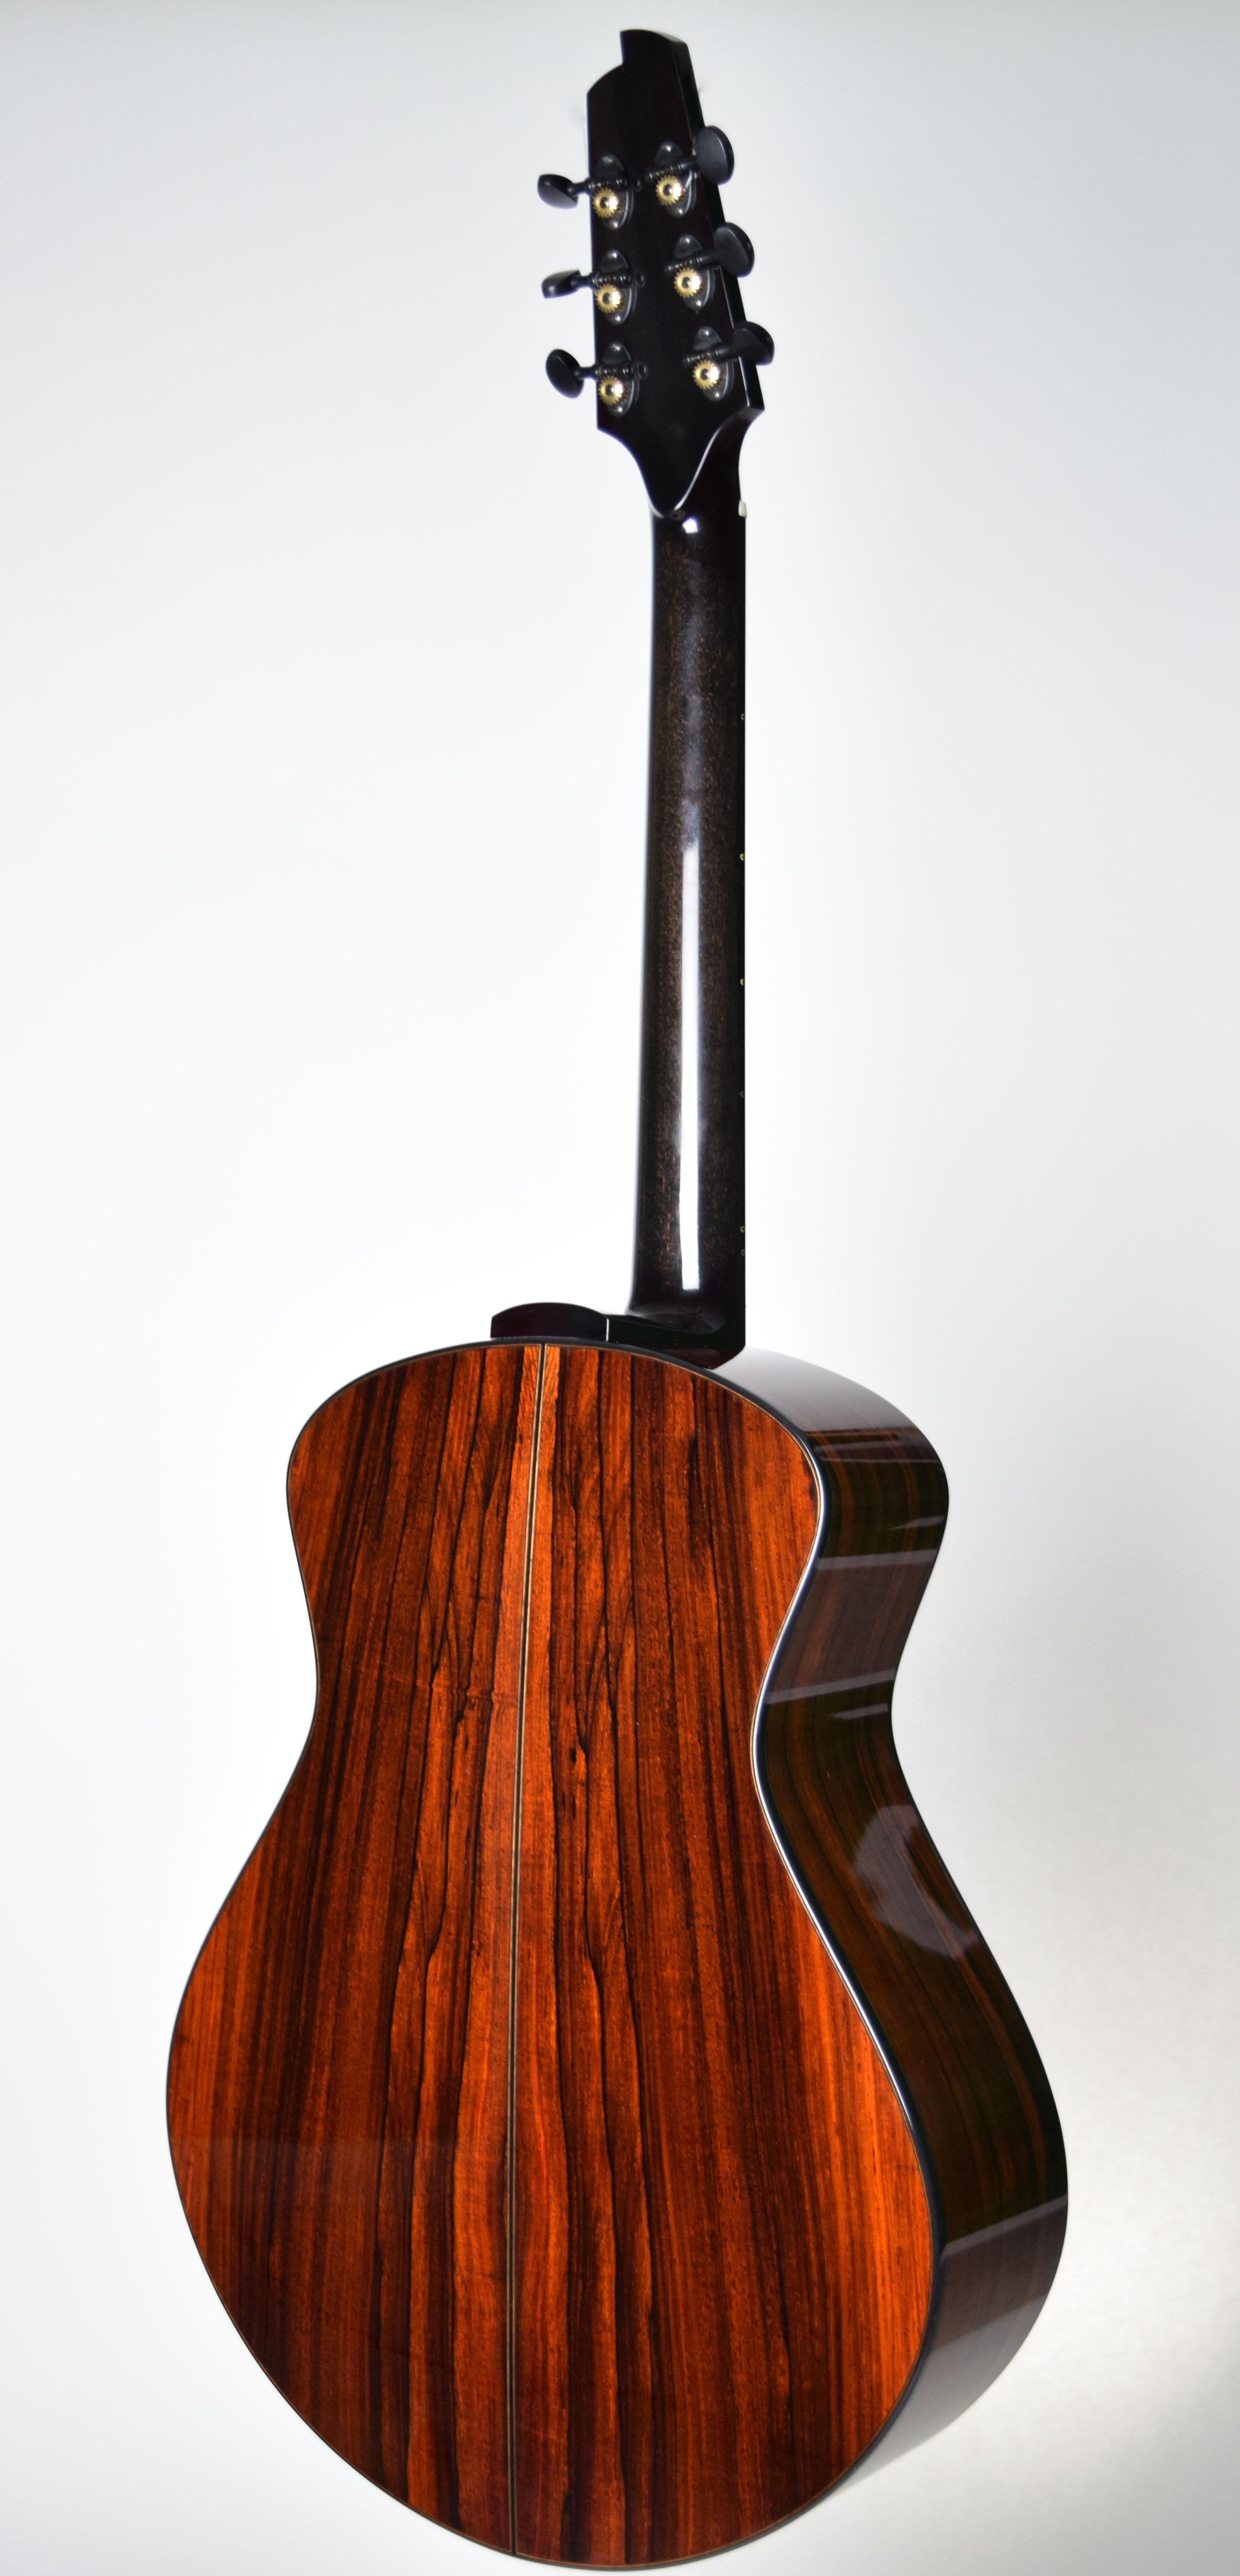 Cocobolo/Engelmann Spruce